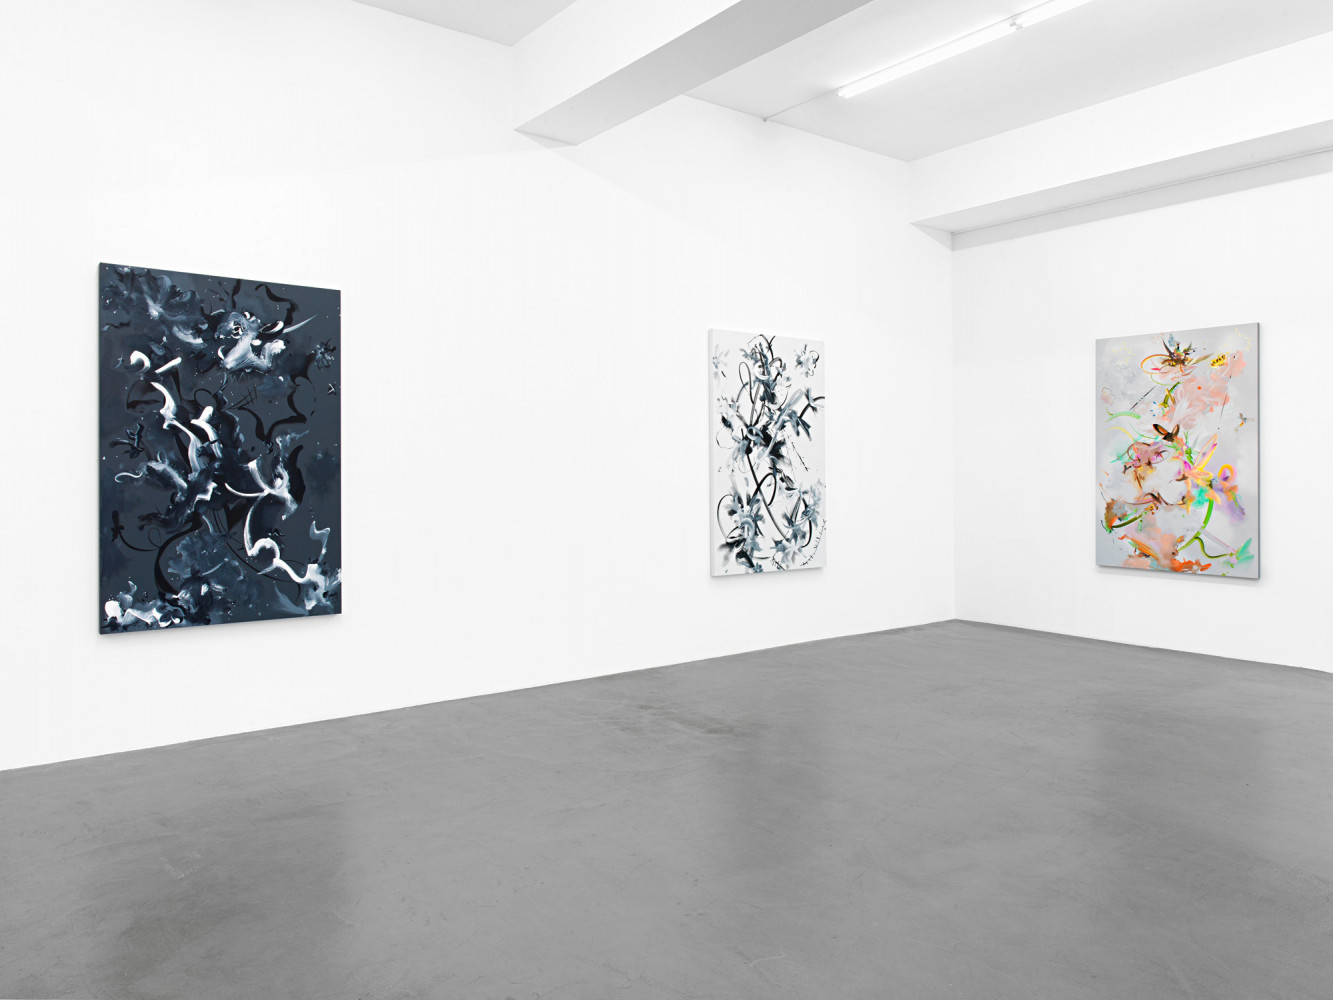 Fiona Rae, Installation view, Buchmann Galerie, 2016